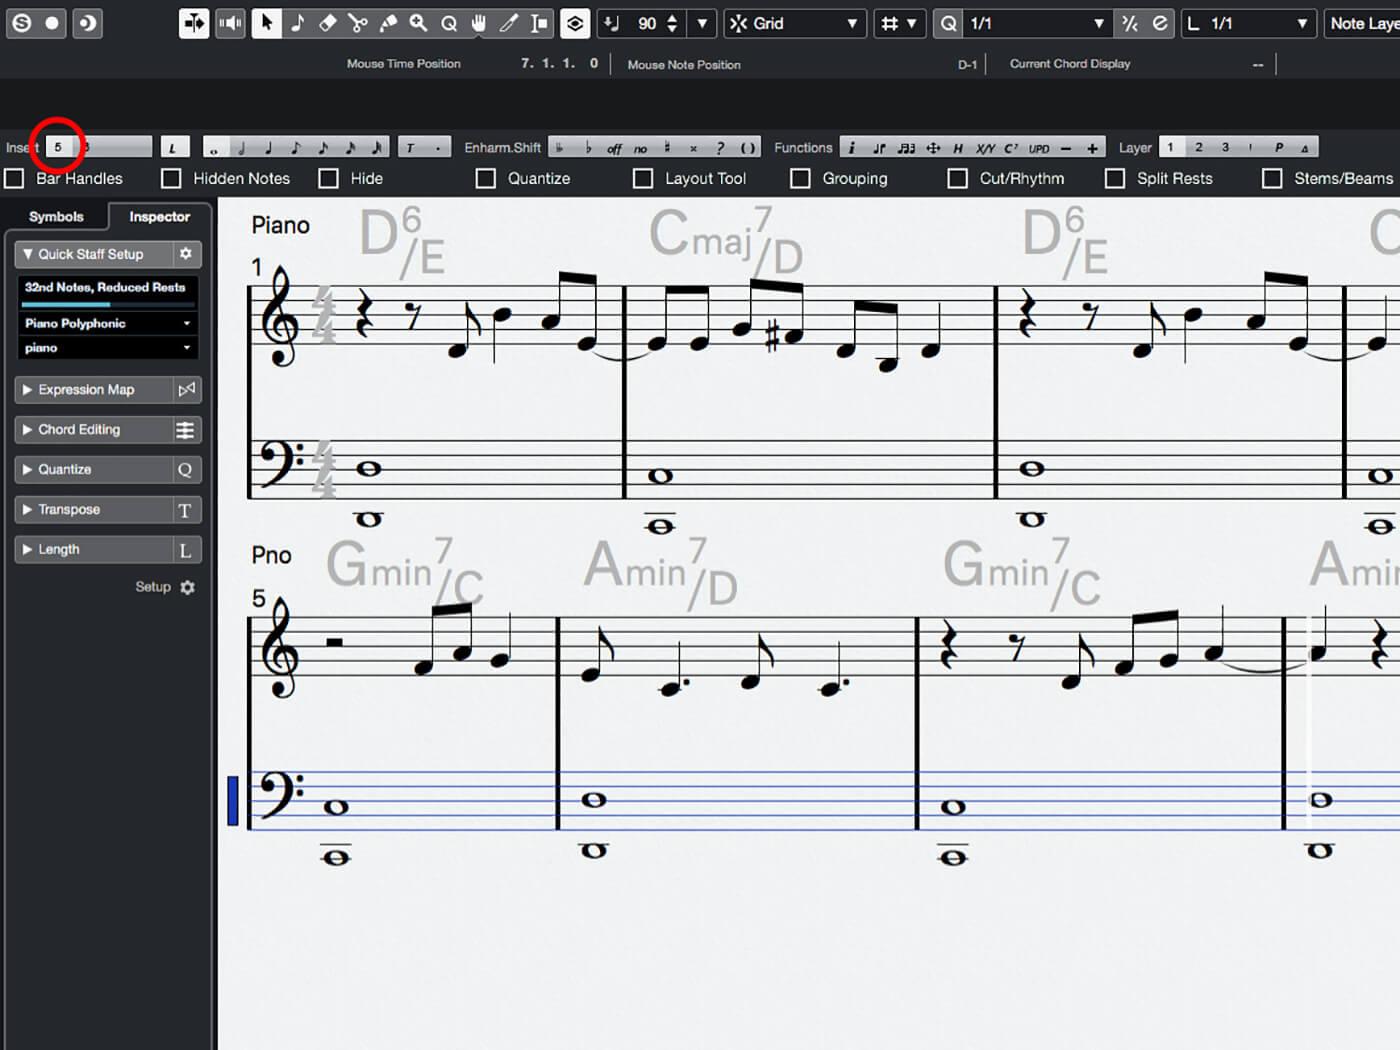 MT 205 Cubase Score Editor Step 14